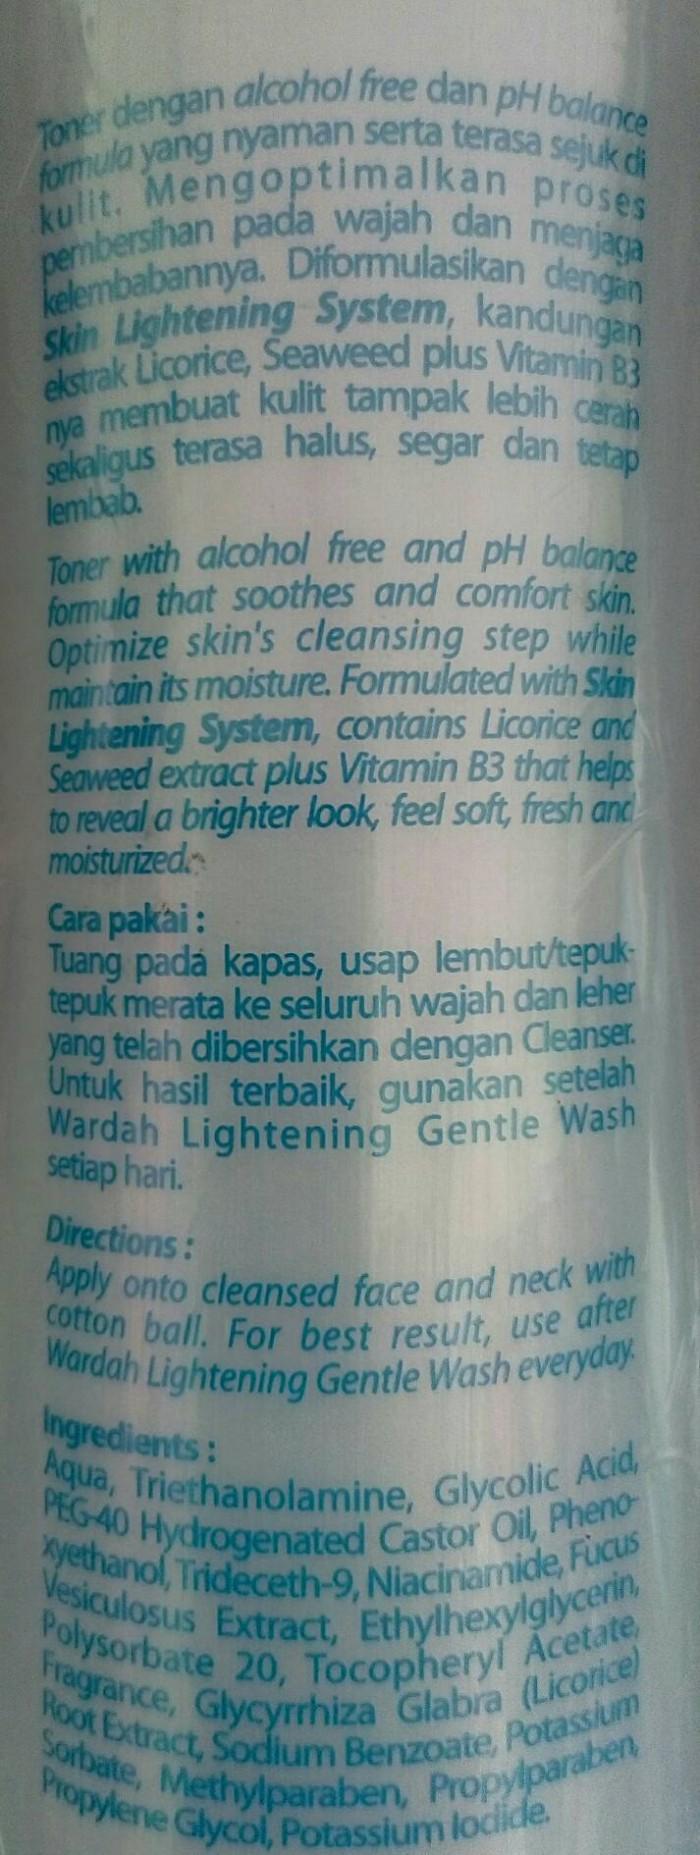 Harga Wardah Lightening Face Toner 150 Ml